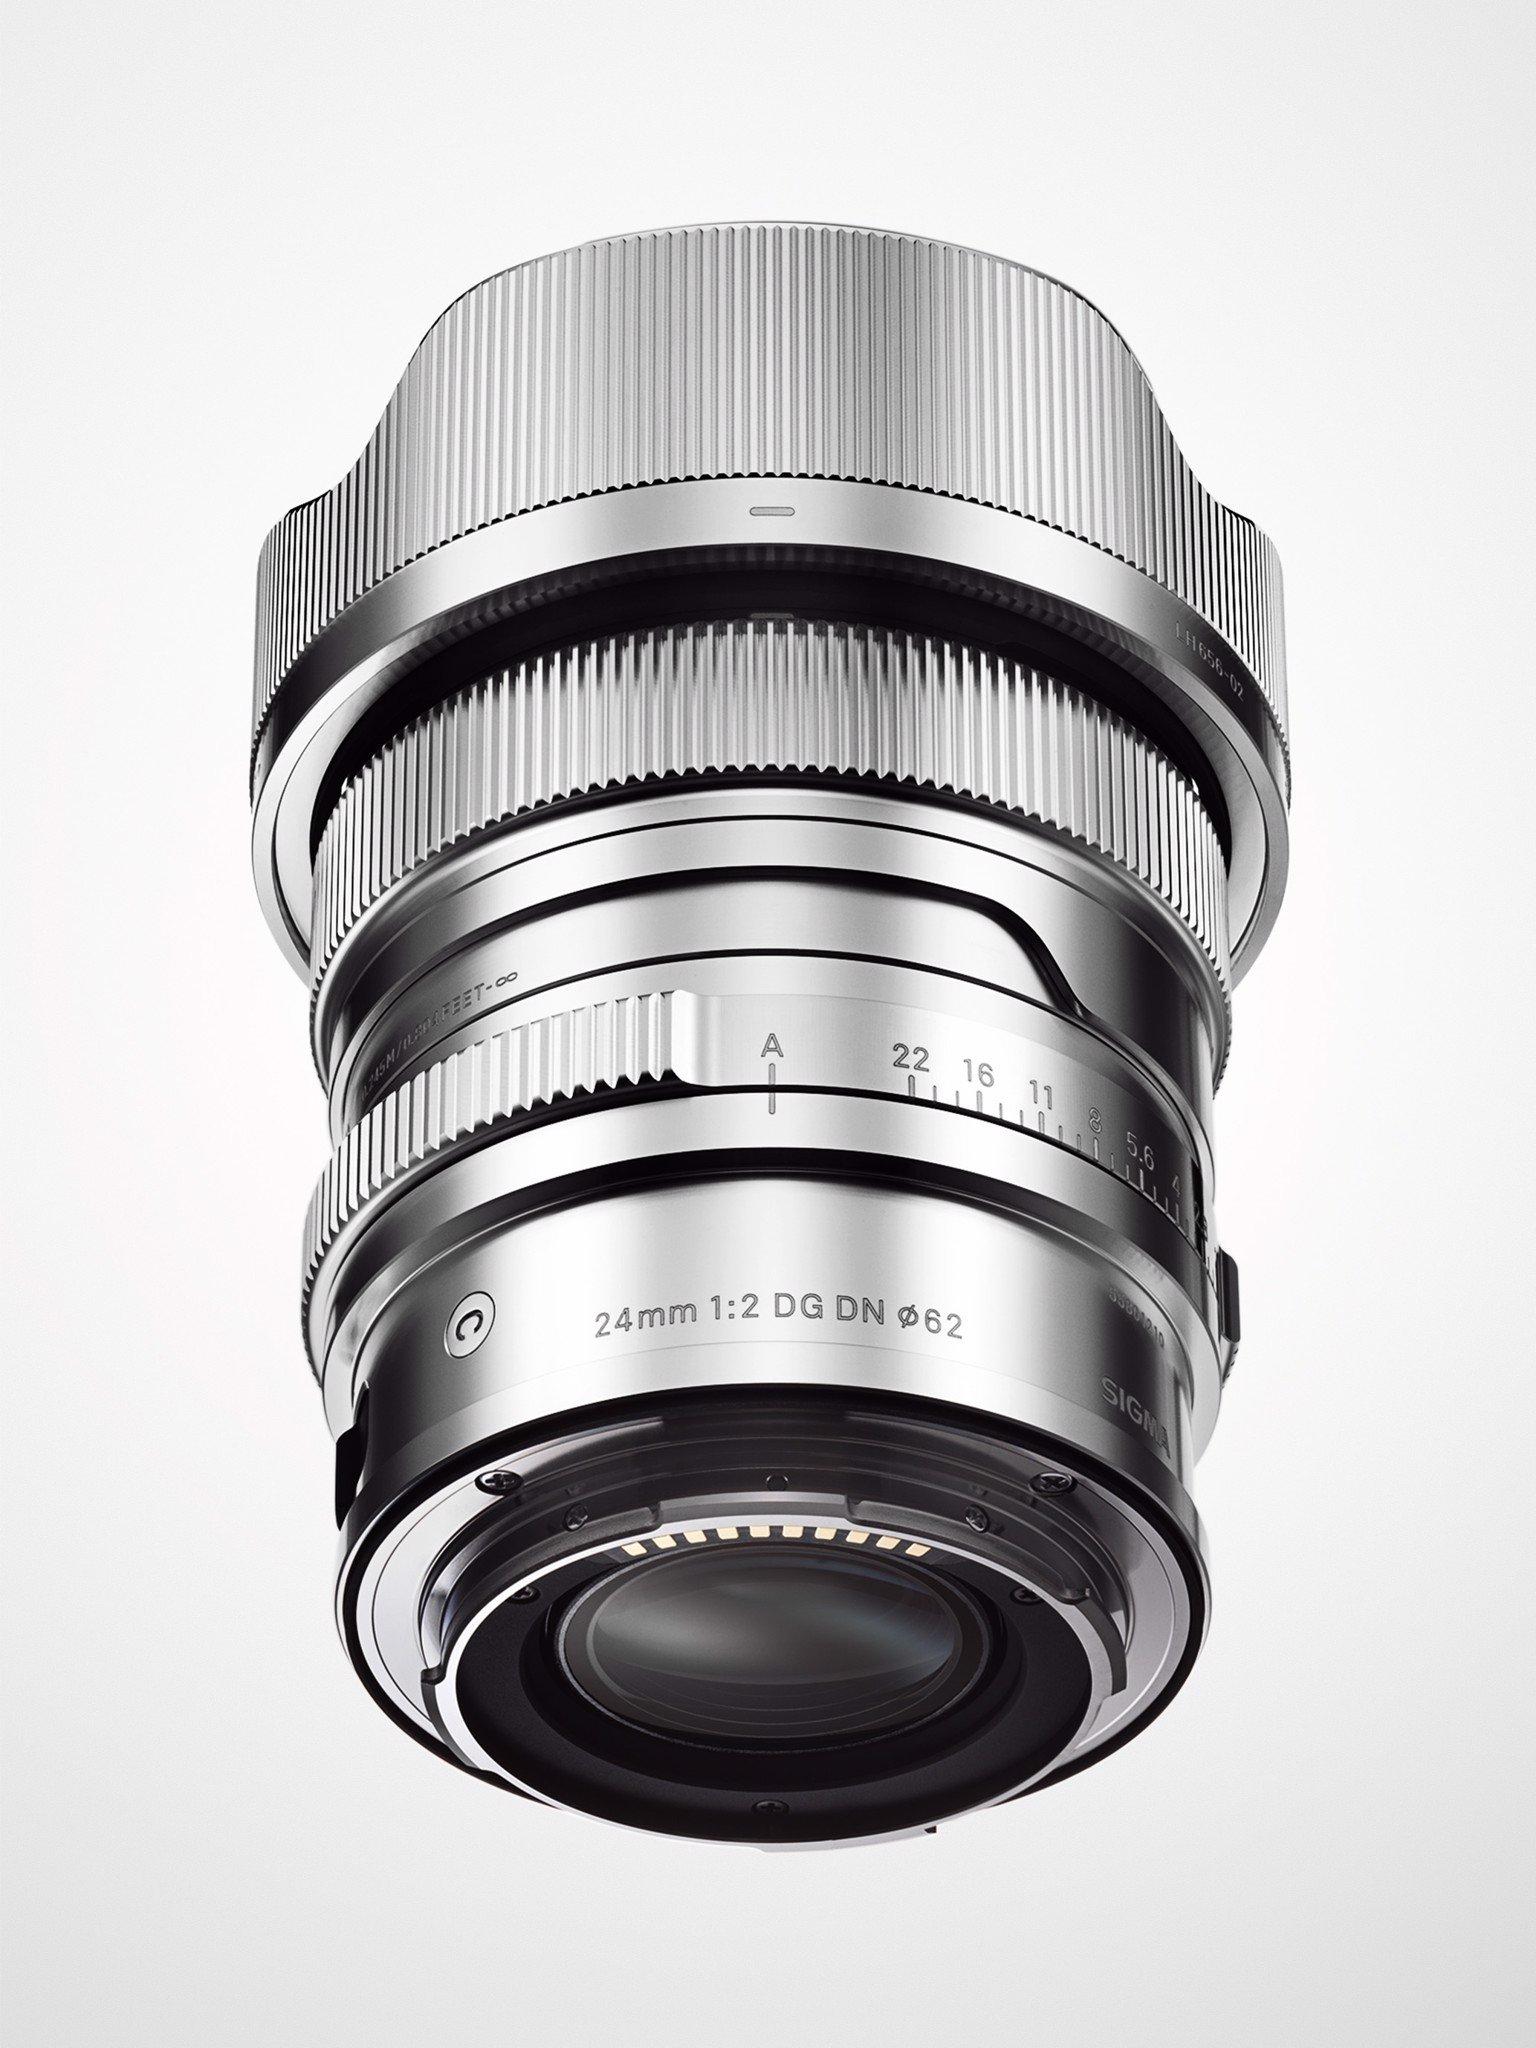 Sigma 24mm F2 DG DN (C) I series